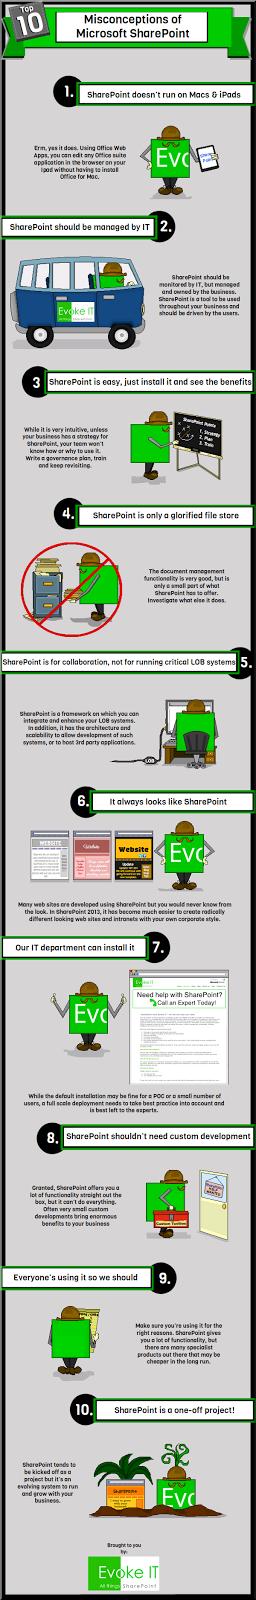 Infographic From Evokeit.com